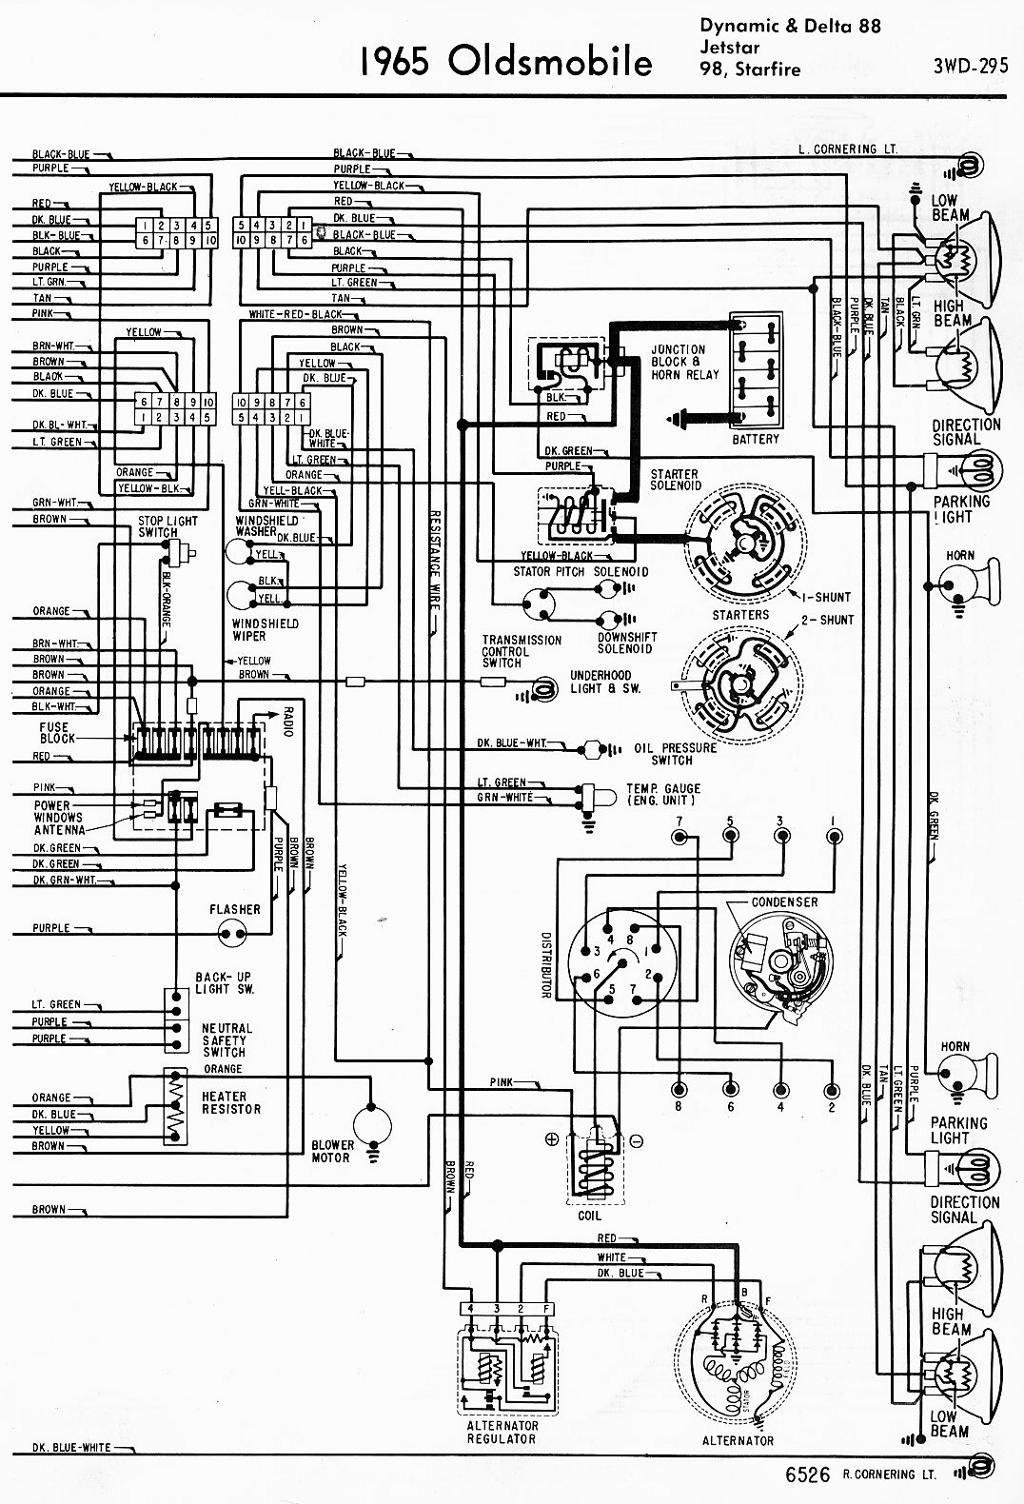 small resolution of nissan tiida air con wiring diagram wiring schematic 1987 nissan pickup wiring diagram nissan tiida a c